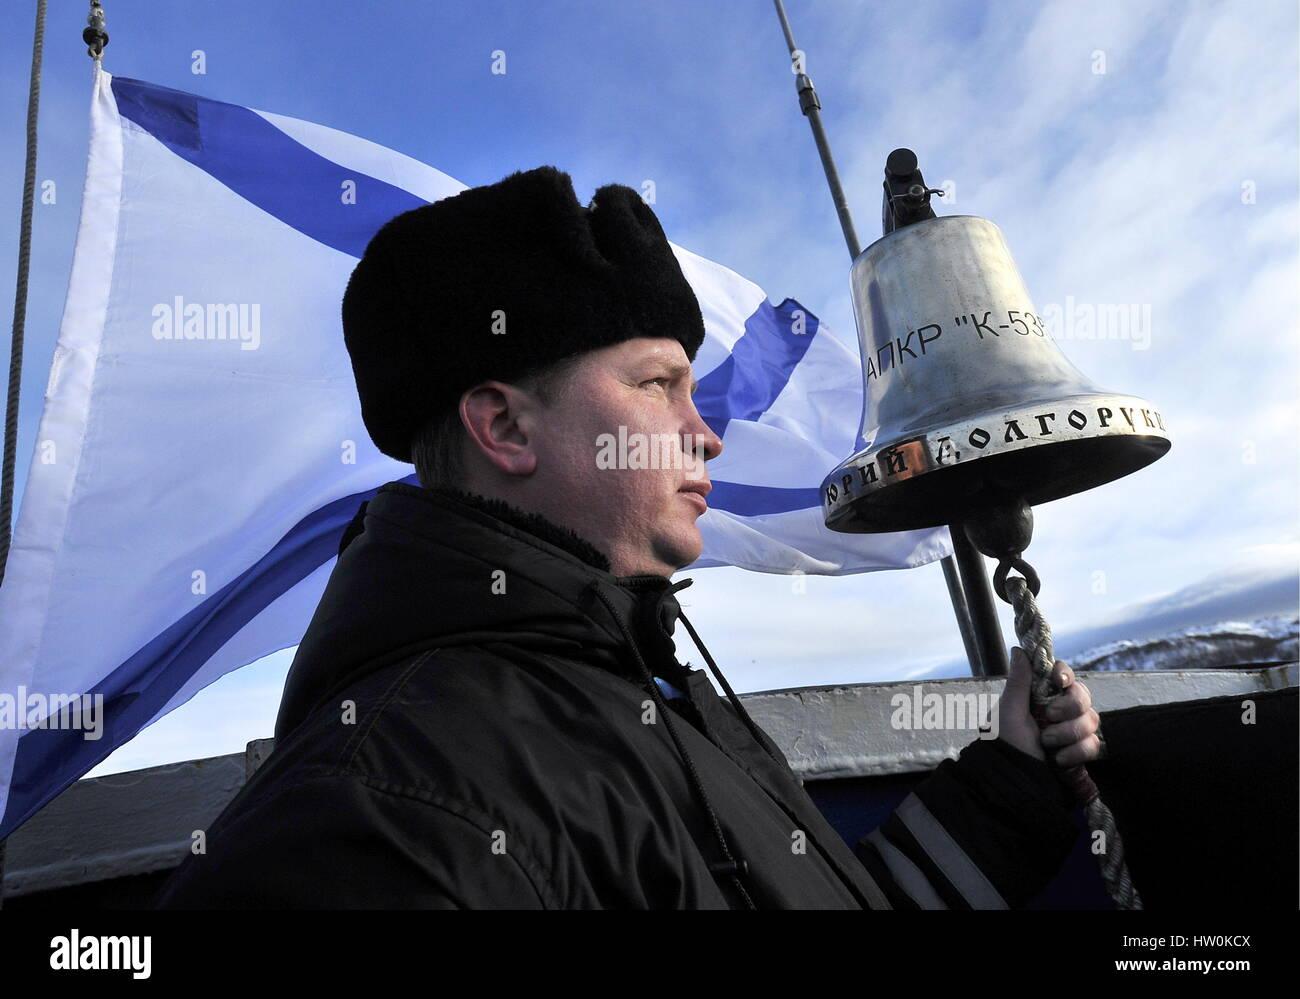 Murmansk Region, Russia. 16th Mar, 2017. A crew member of Russia's Yury Dolgoruky nuclear-powered ballistic - Stock Image